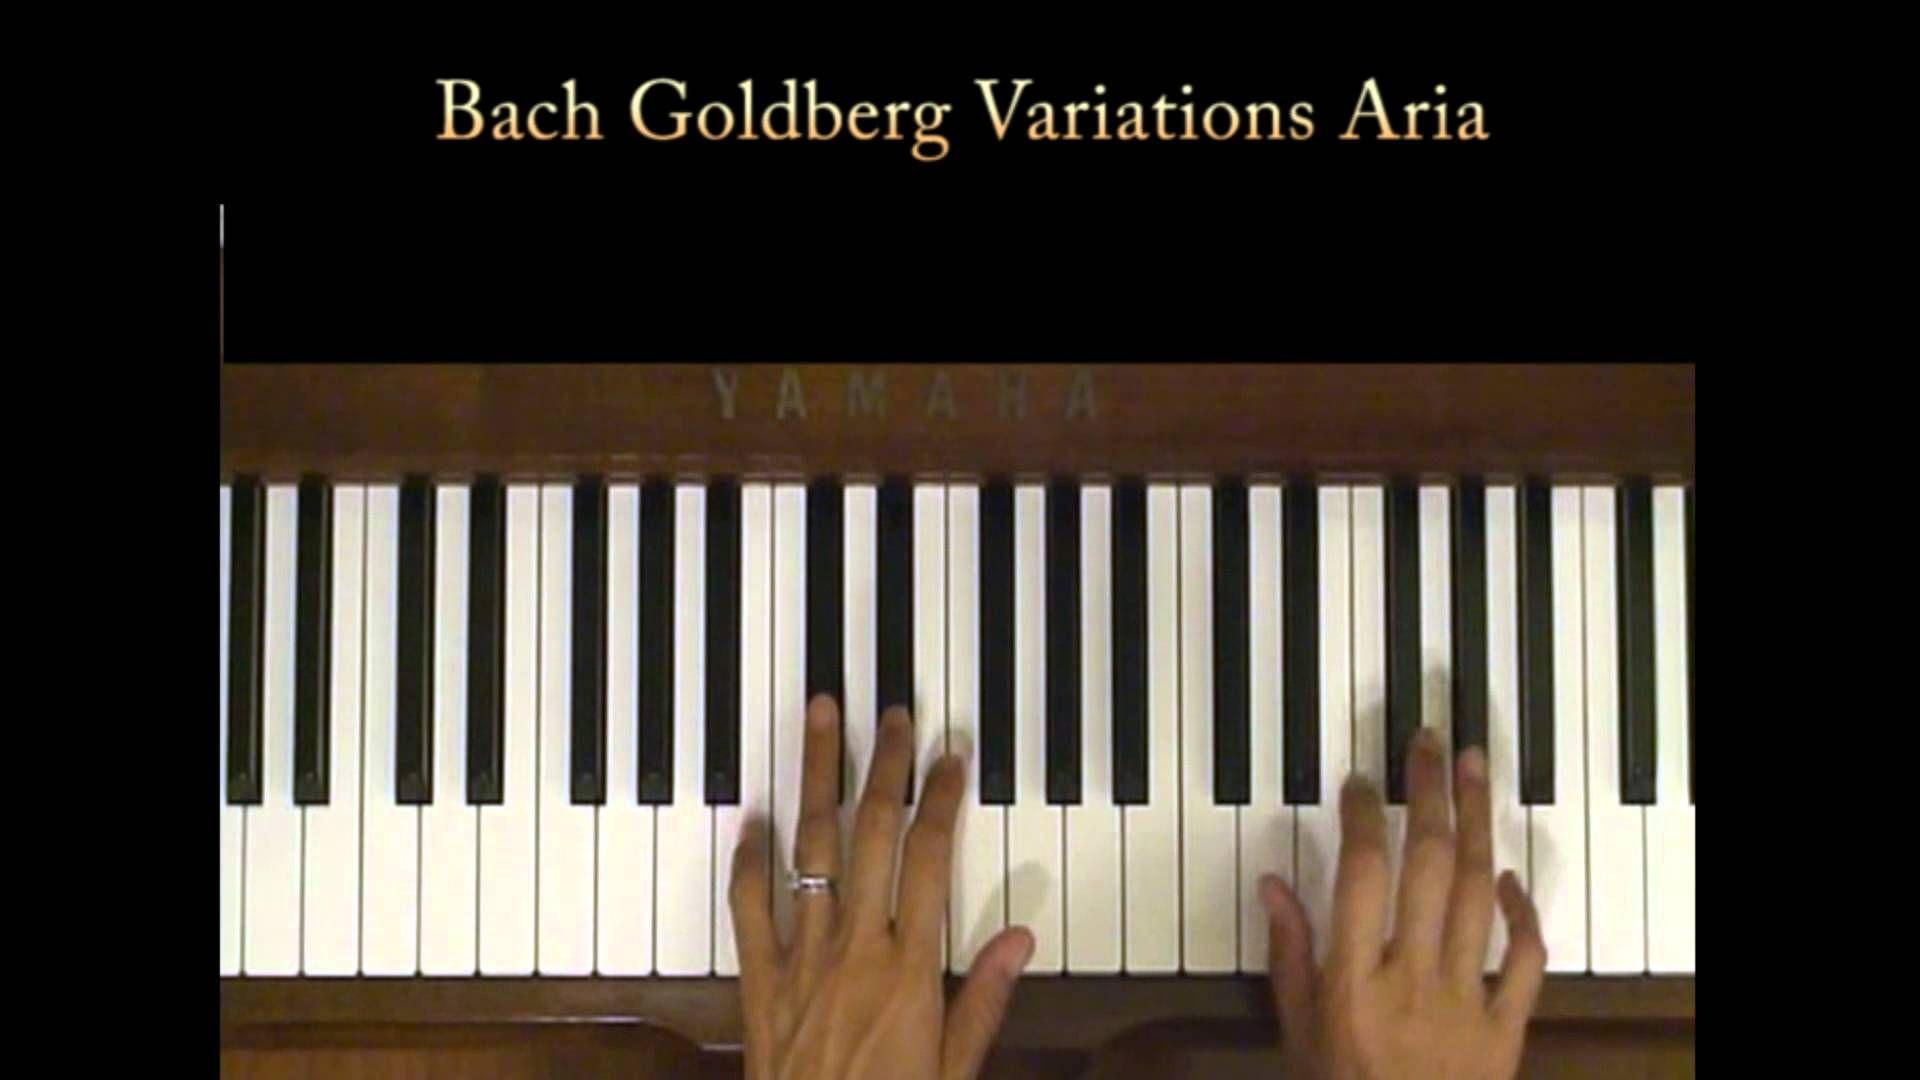 Bach Goldberg Variations Aria Piano Tutorial Slow Piano Tutorial Piano Bach